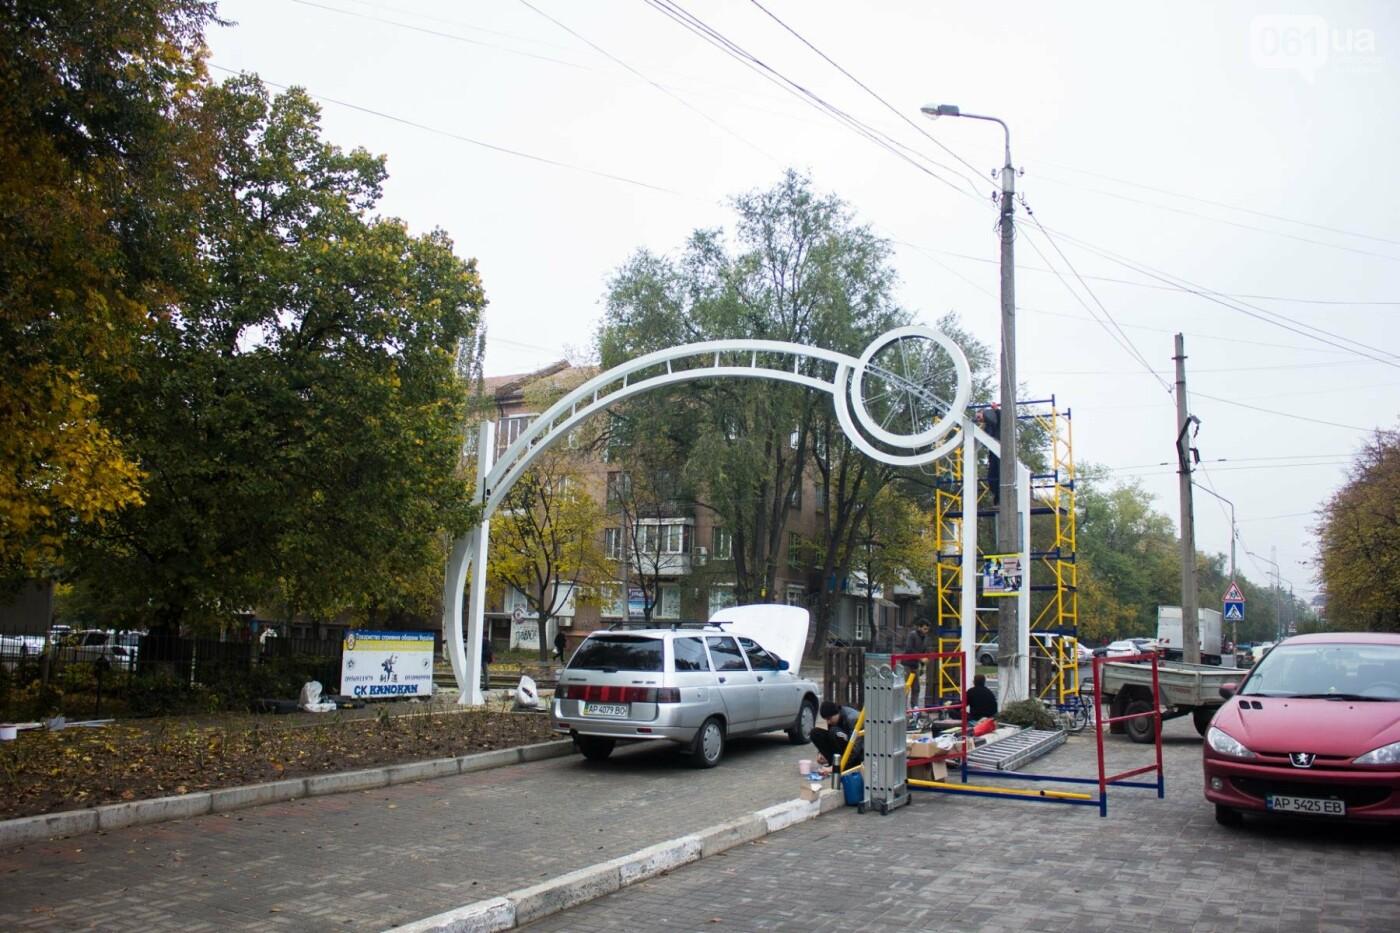 В Запорожье заканчивают установку арки у входа в аллею роз, - ФОТОФАКТ, фото-4